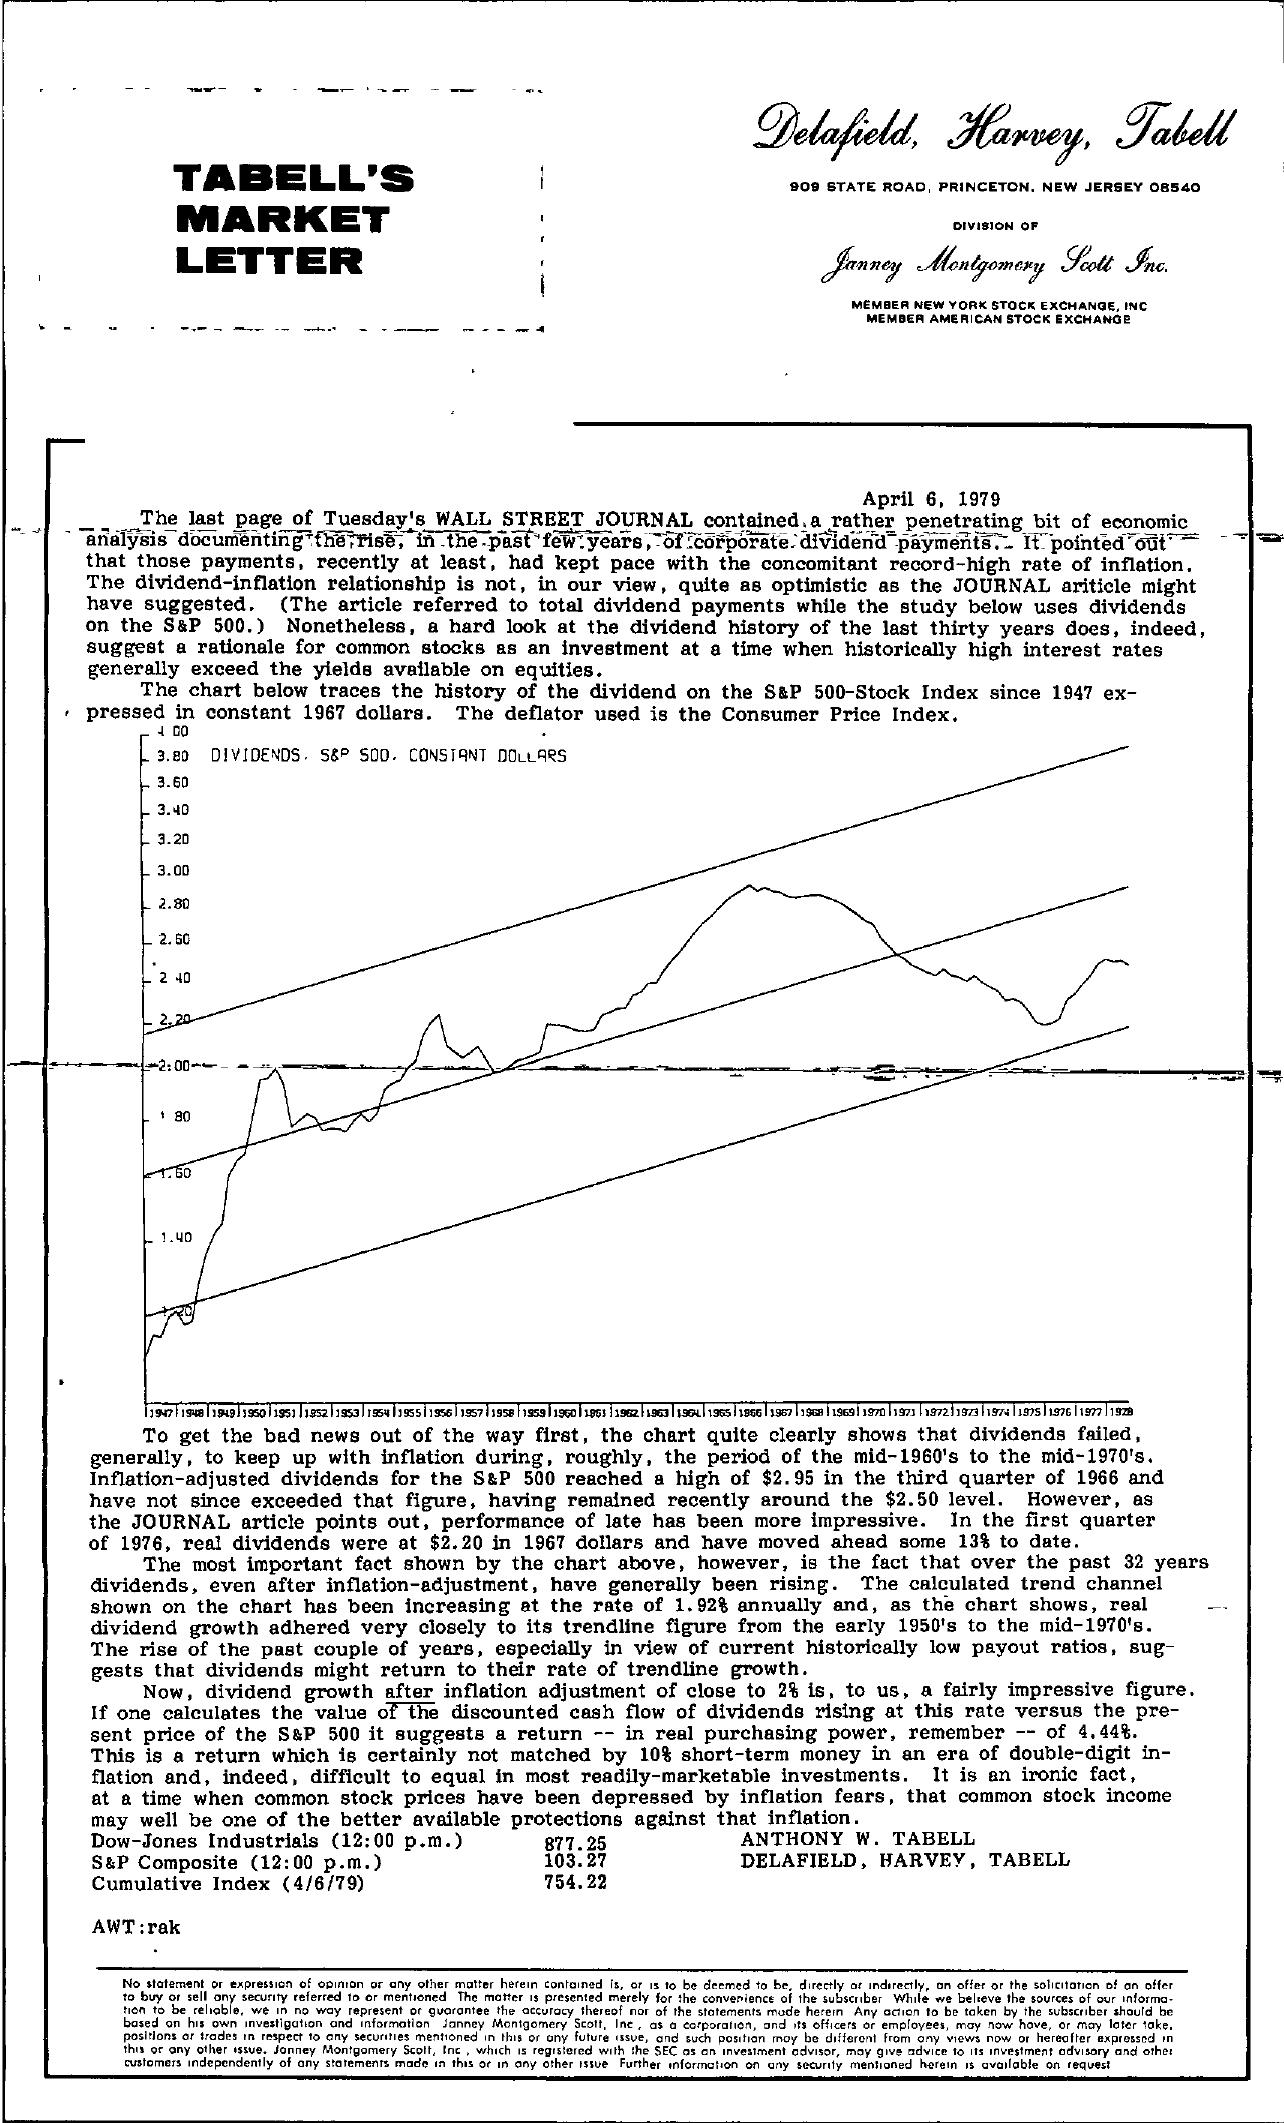 Tabell's Market Letter - April 06, 1979